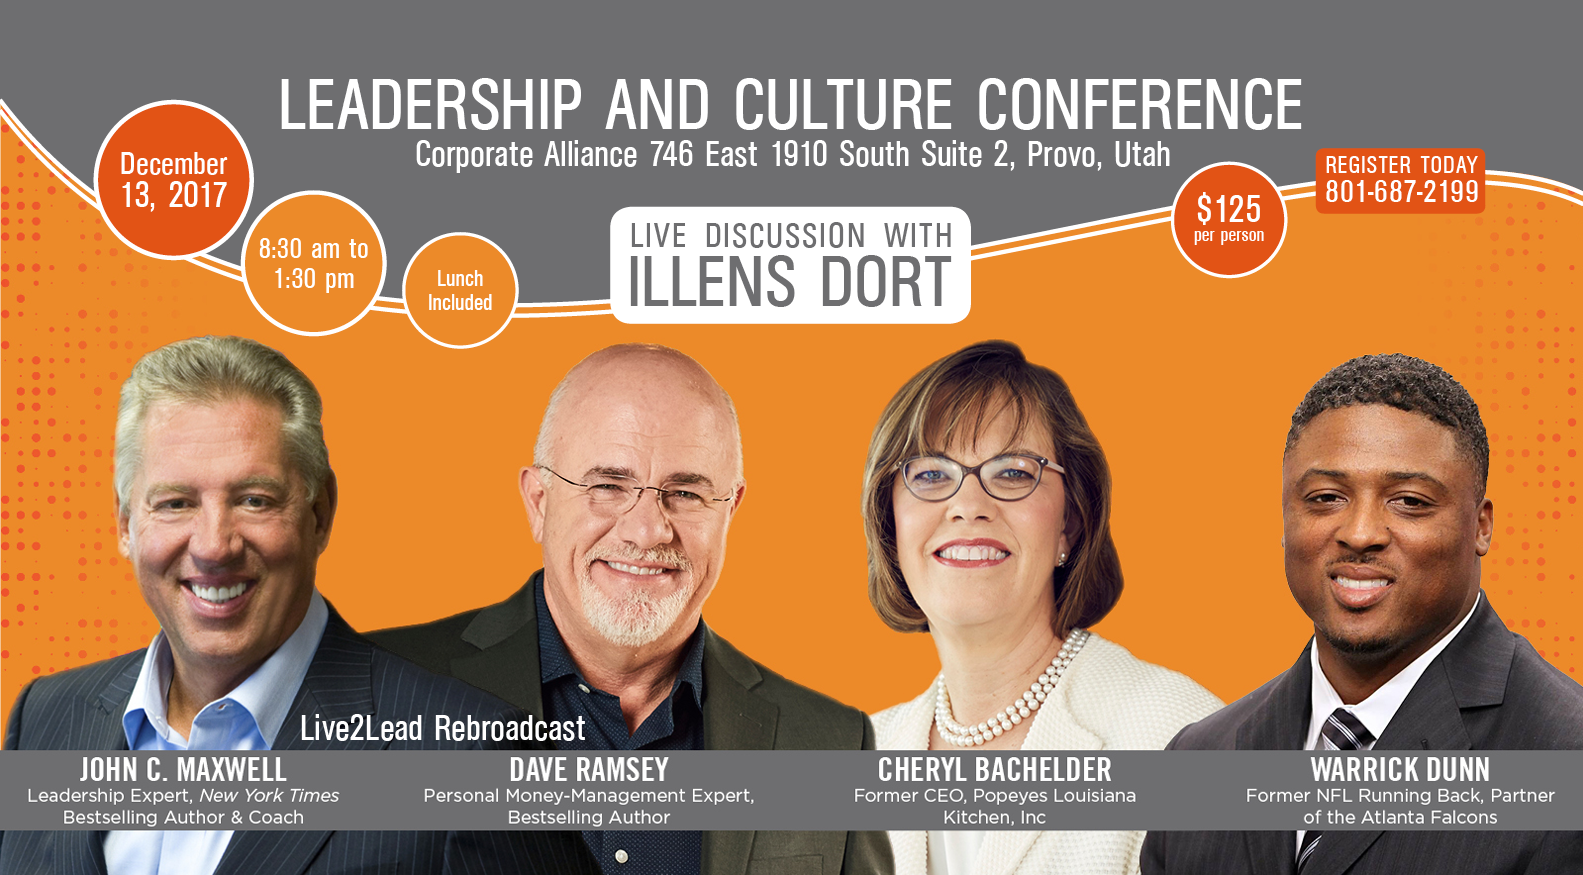 LeadershipConference(1).png